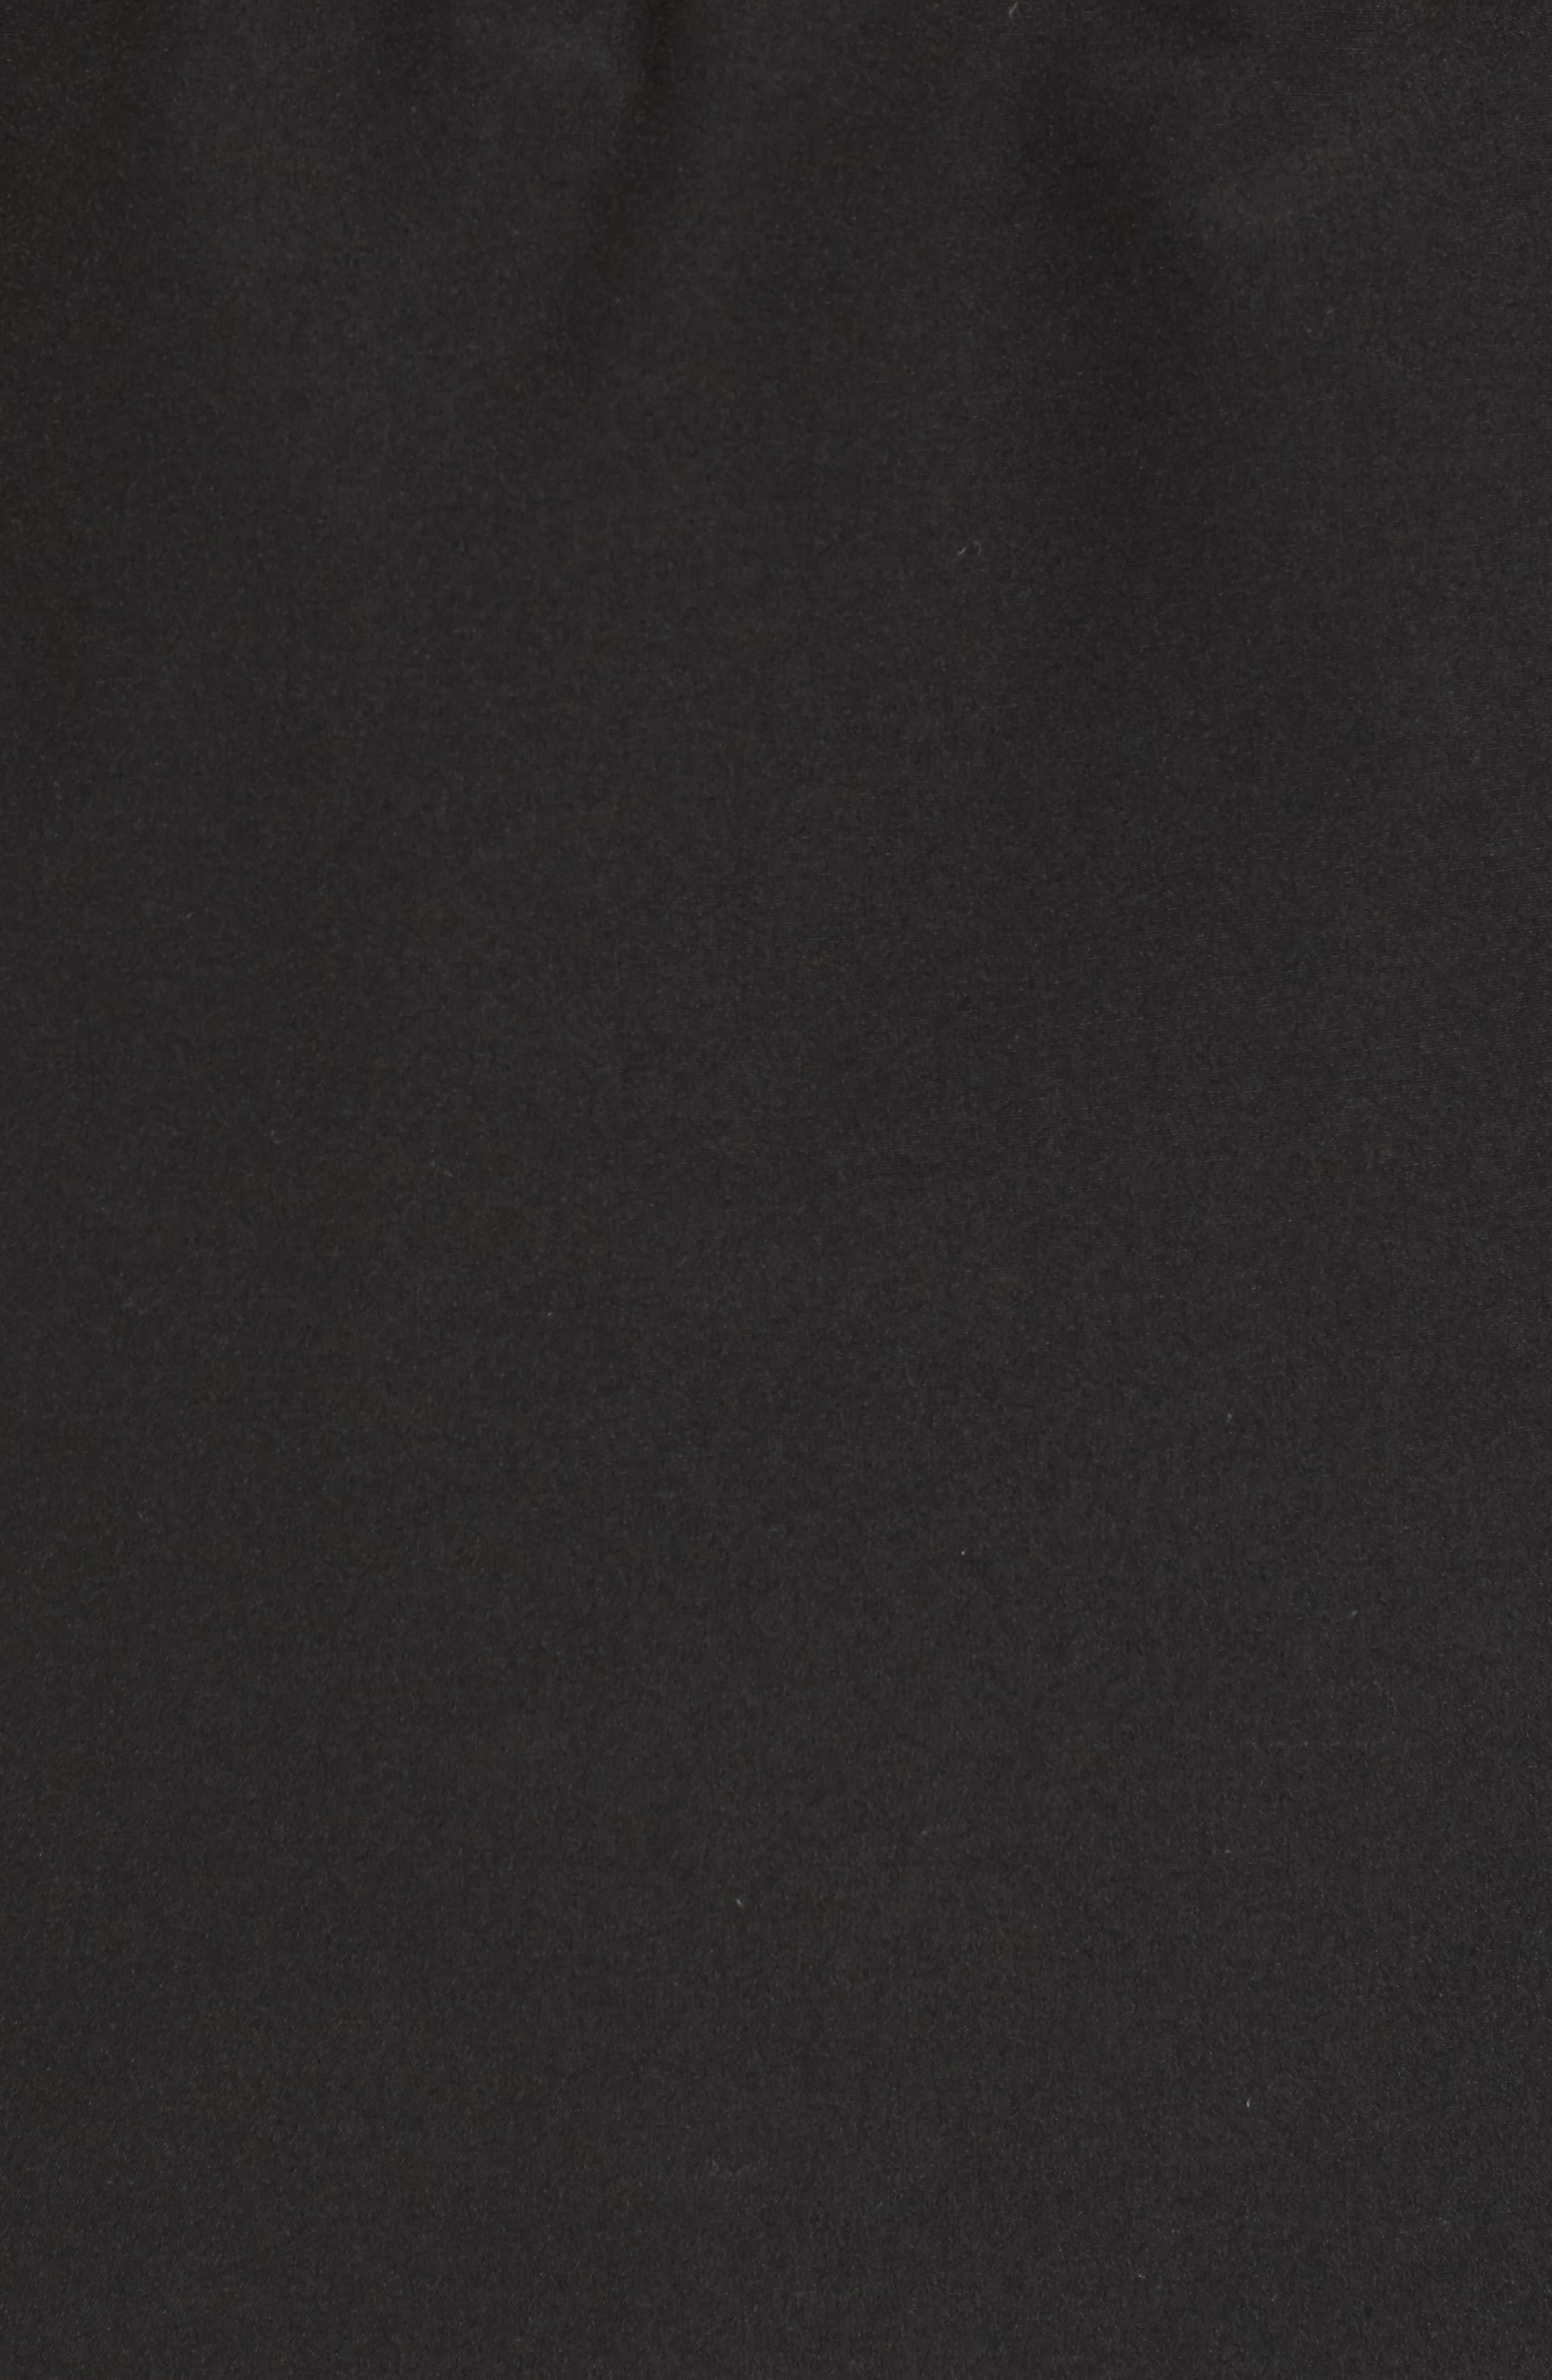 Perley Waterproof 675-Fill-Power Down 3-in-1 Parka,                             Alternate thumbnail 6, color,                             Black